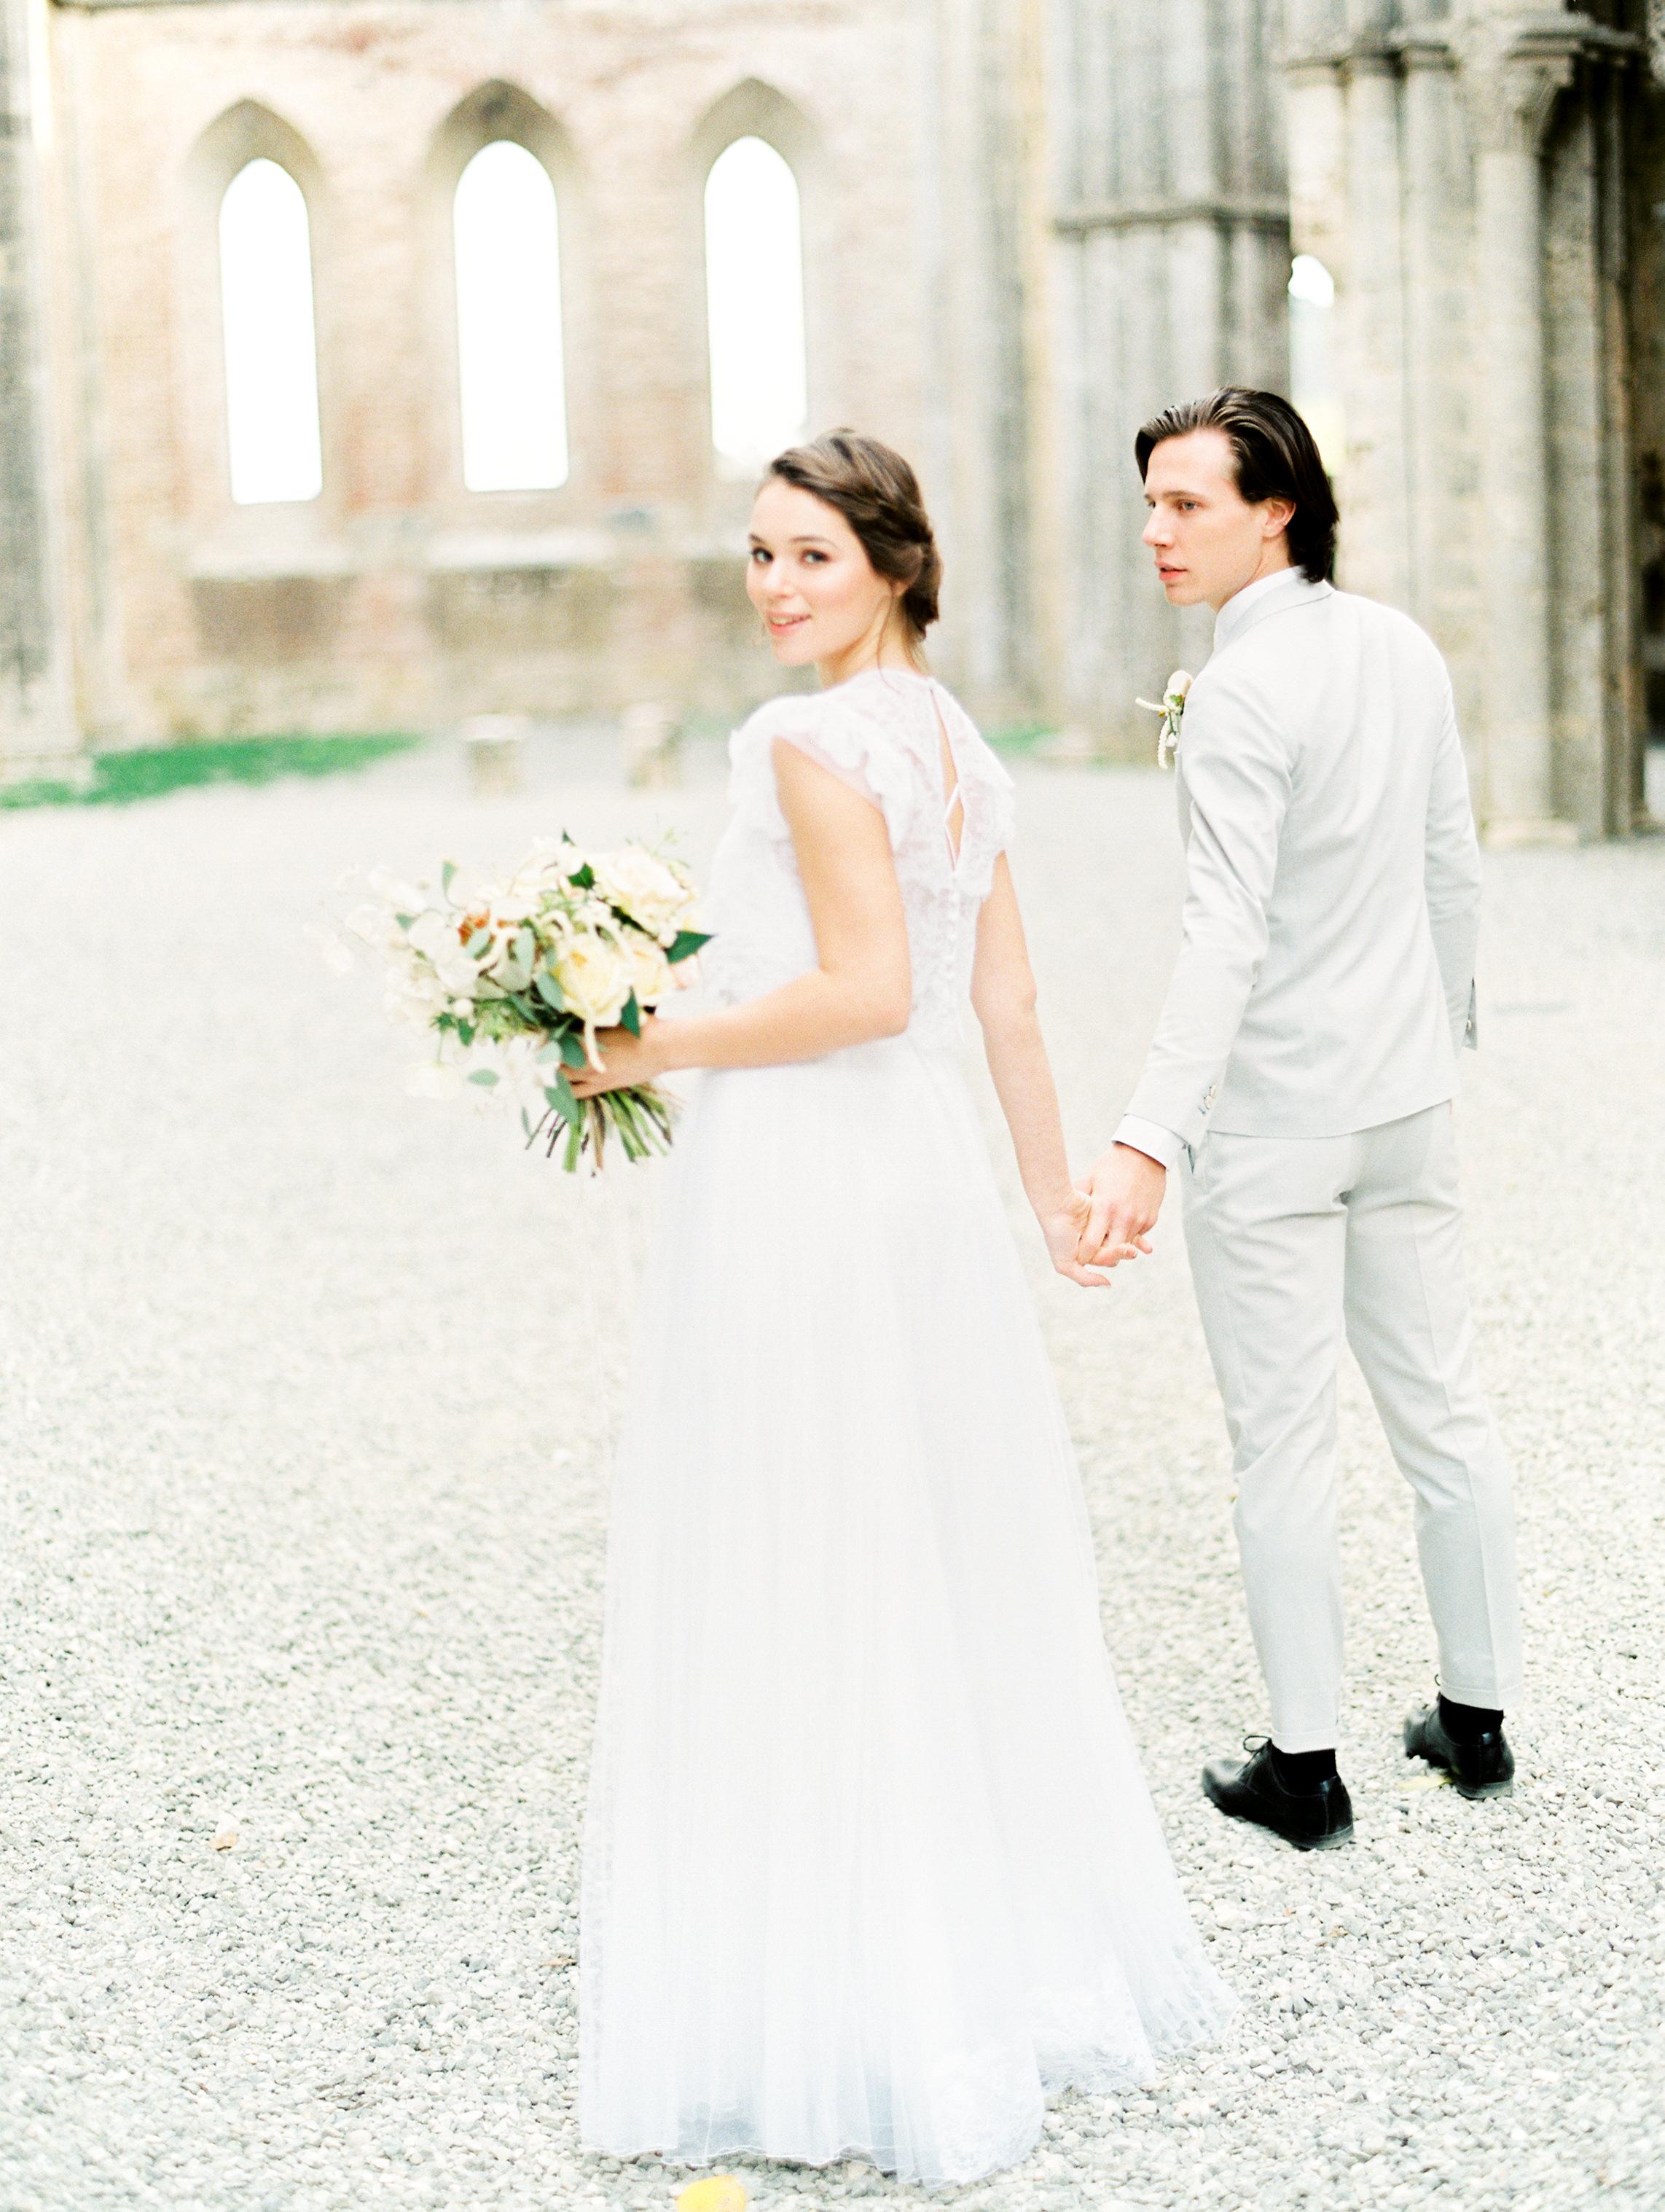 romantic-italy-wedding-in-tuscany-117.jpg